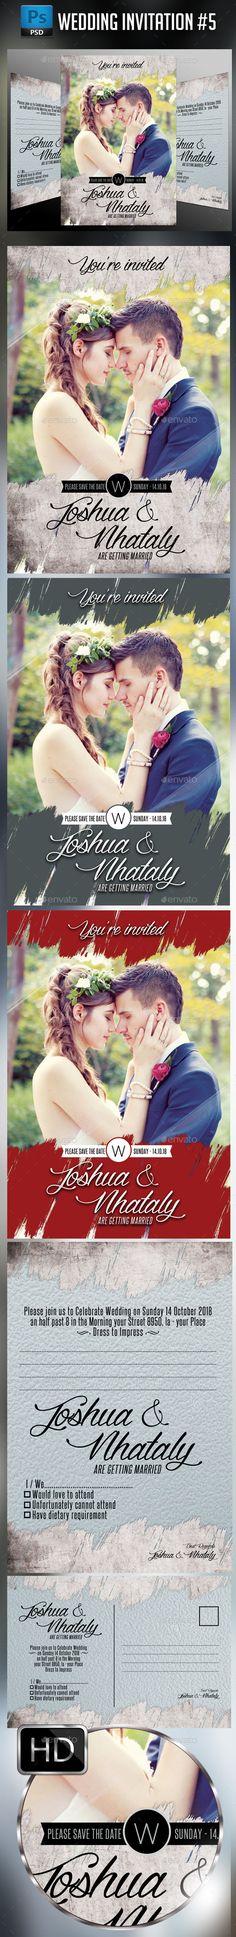 Wedding Invitation Template #design Download: http://graphicriver.net/item/wedding-invitation-5/12356964?ref=ksioks